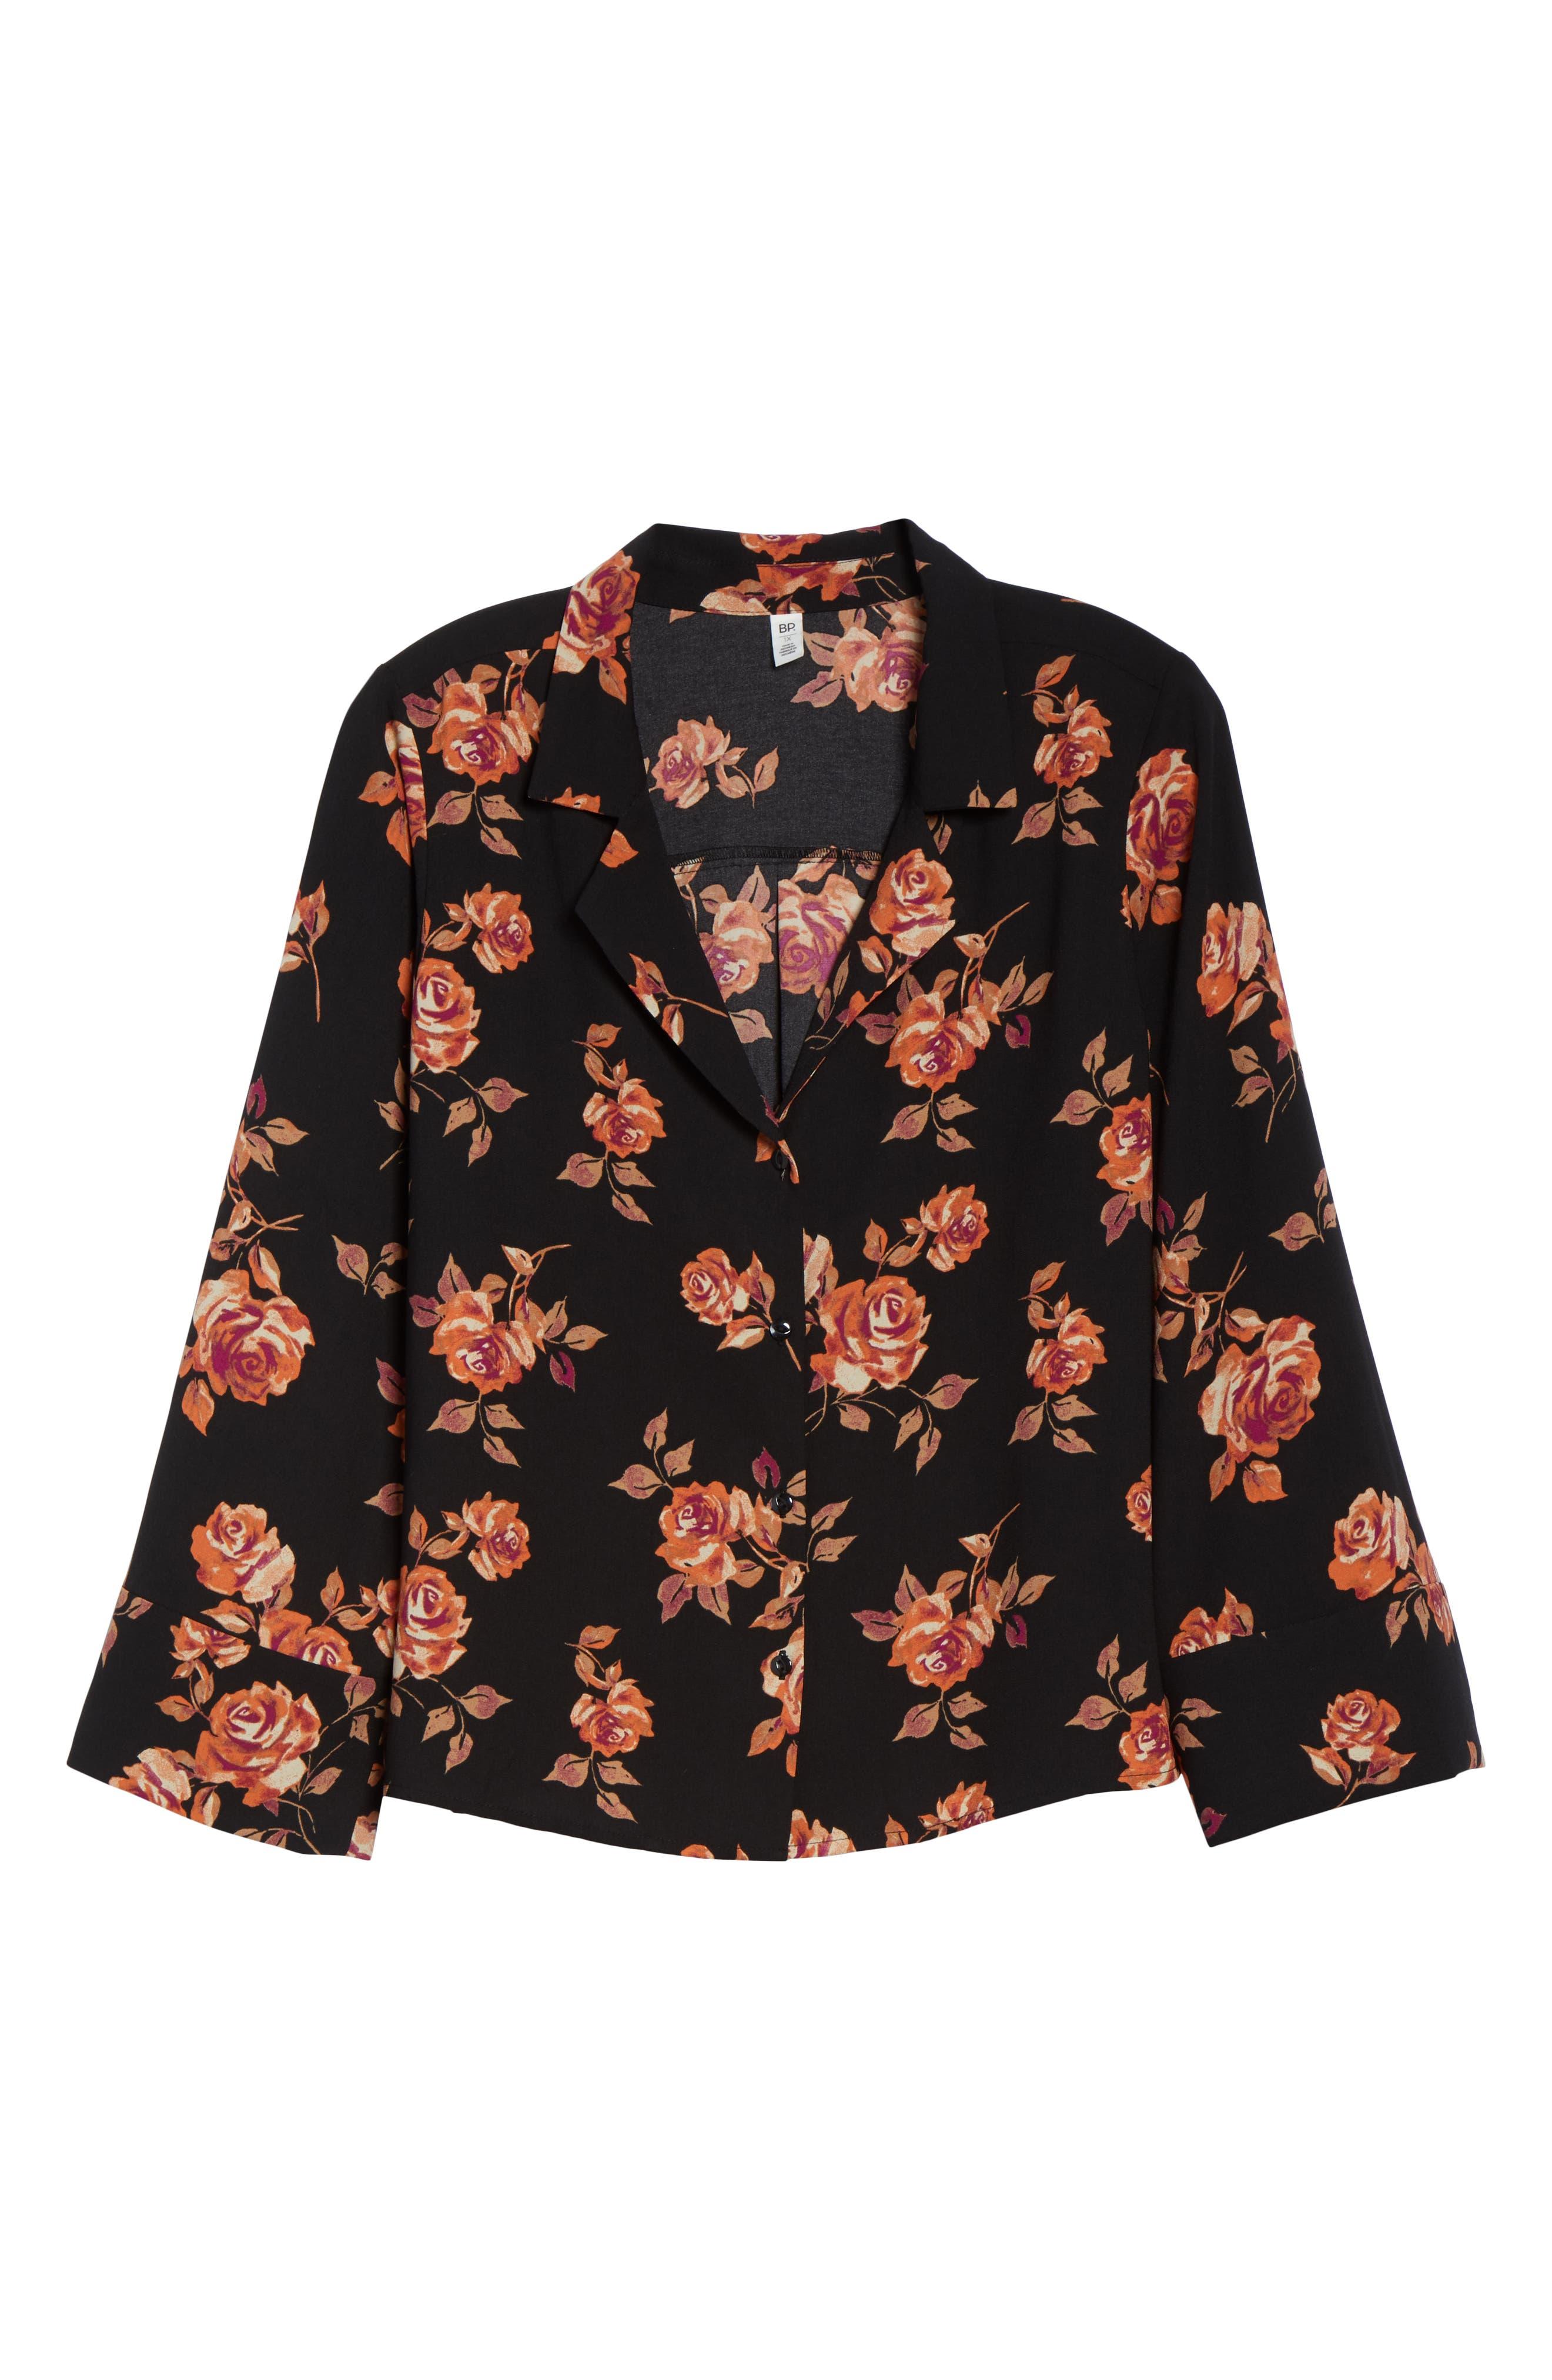 Notched Collar Floral Print Shirt,                             Alternate thumbnail 6, color,                             BLACK POP FLORAL